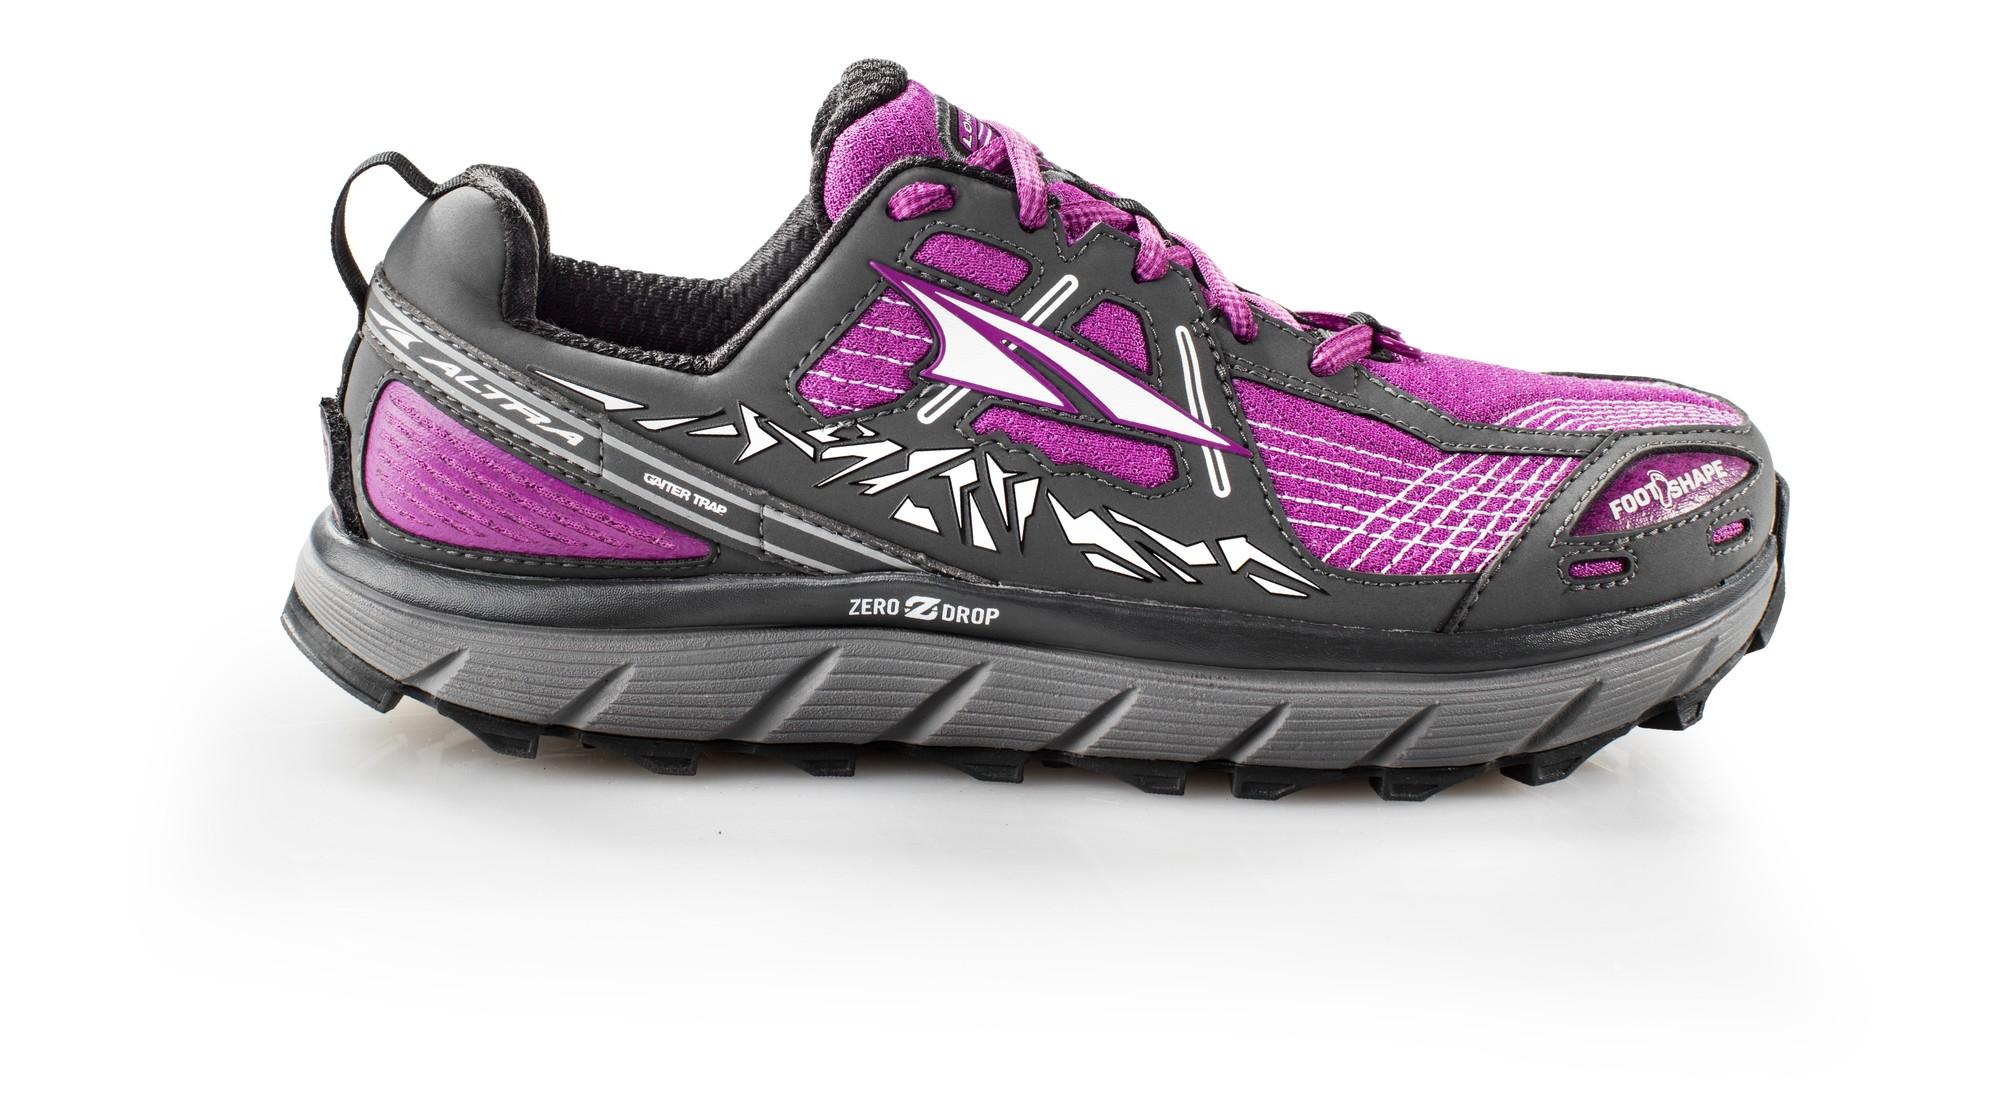 Altra - Lone Peak 3.5 - Trail Running shoes - Women's